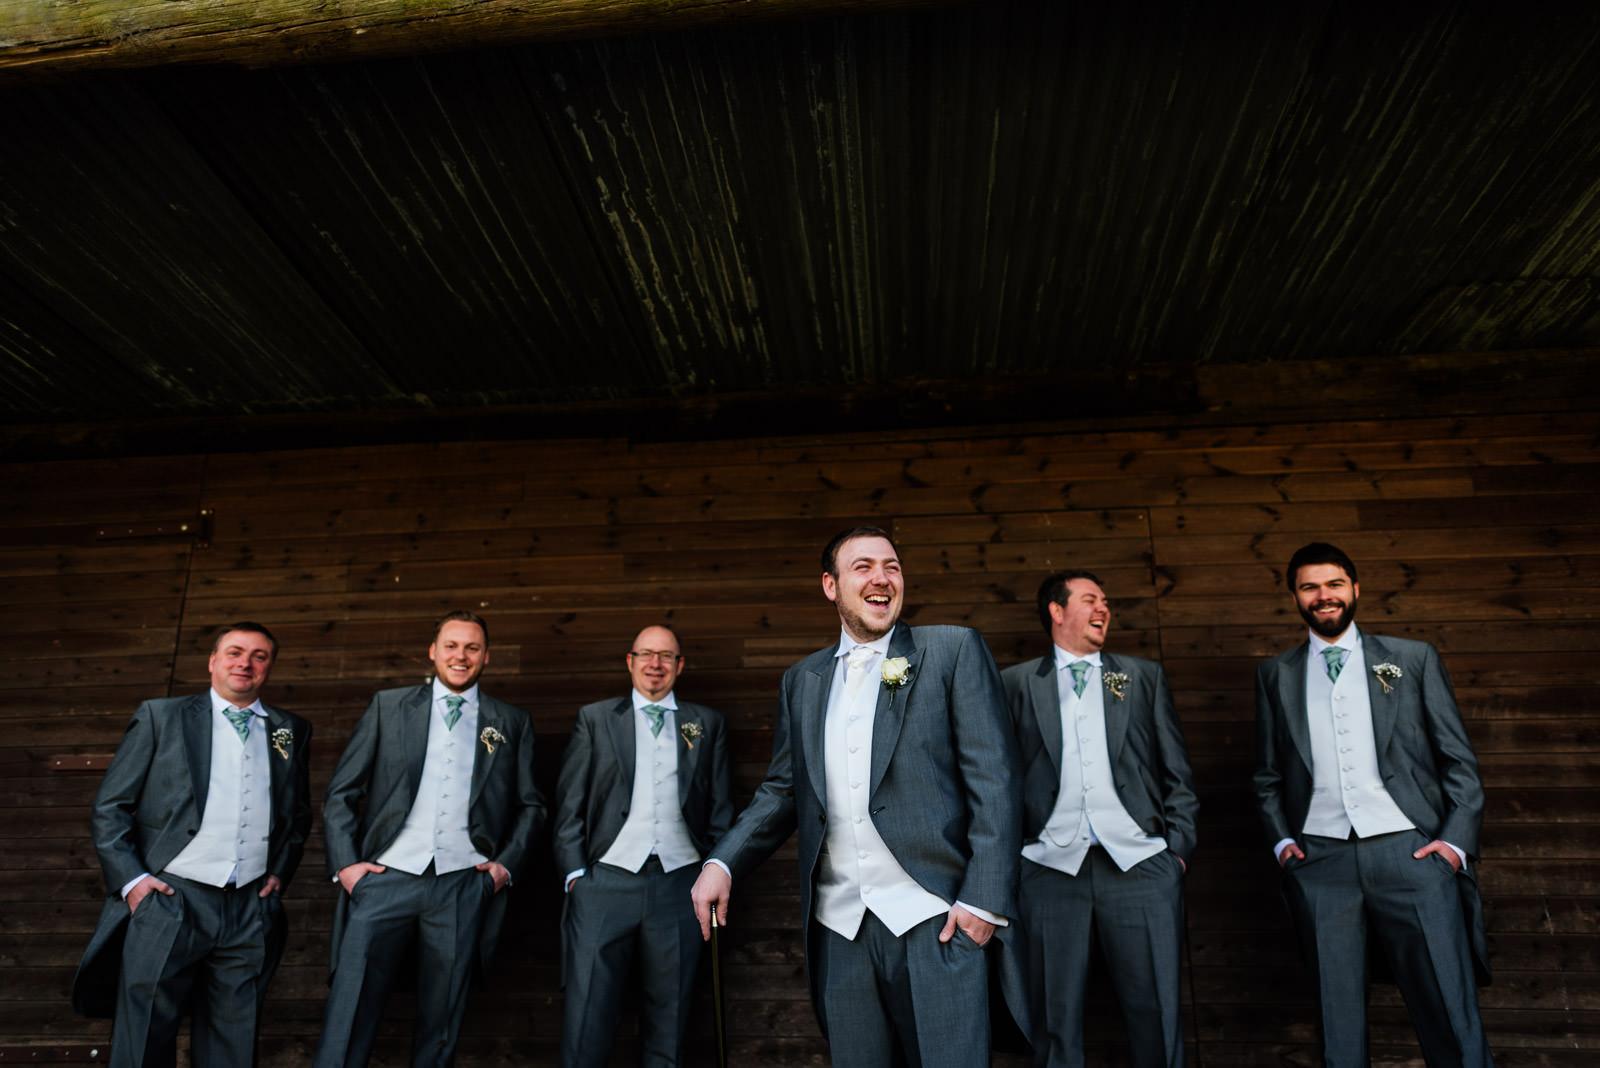 Richard and his groomsmen